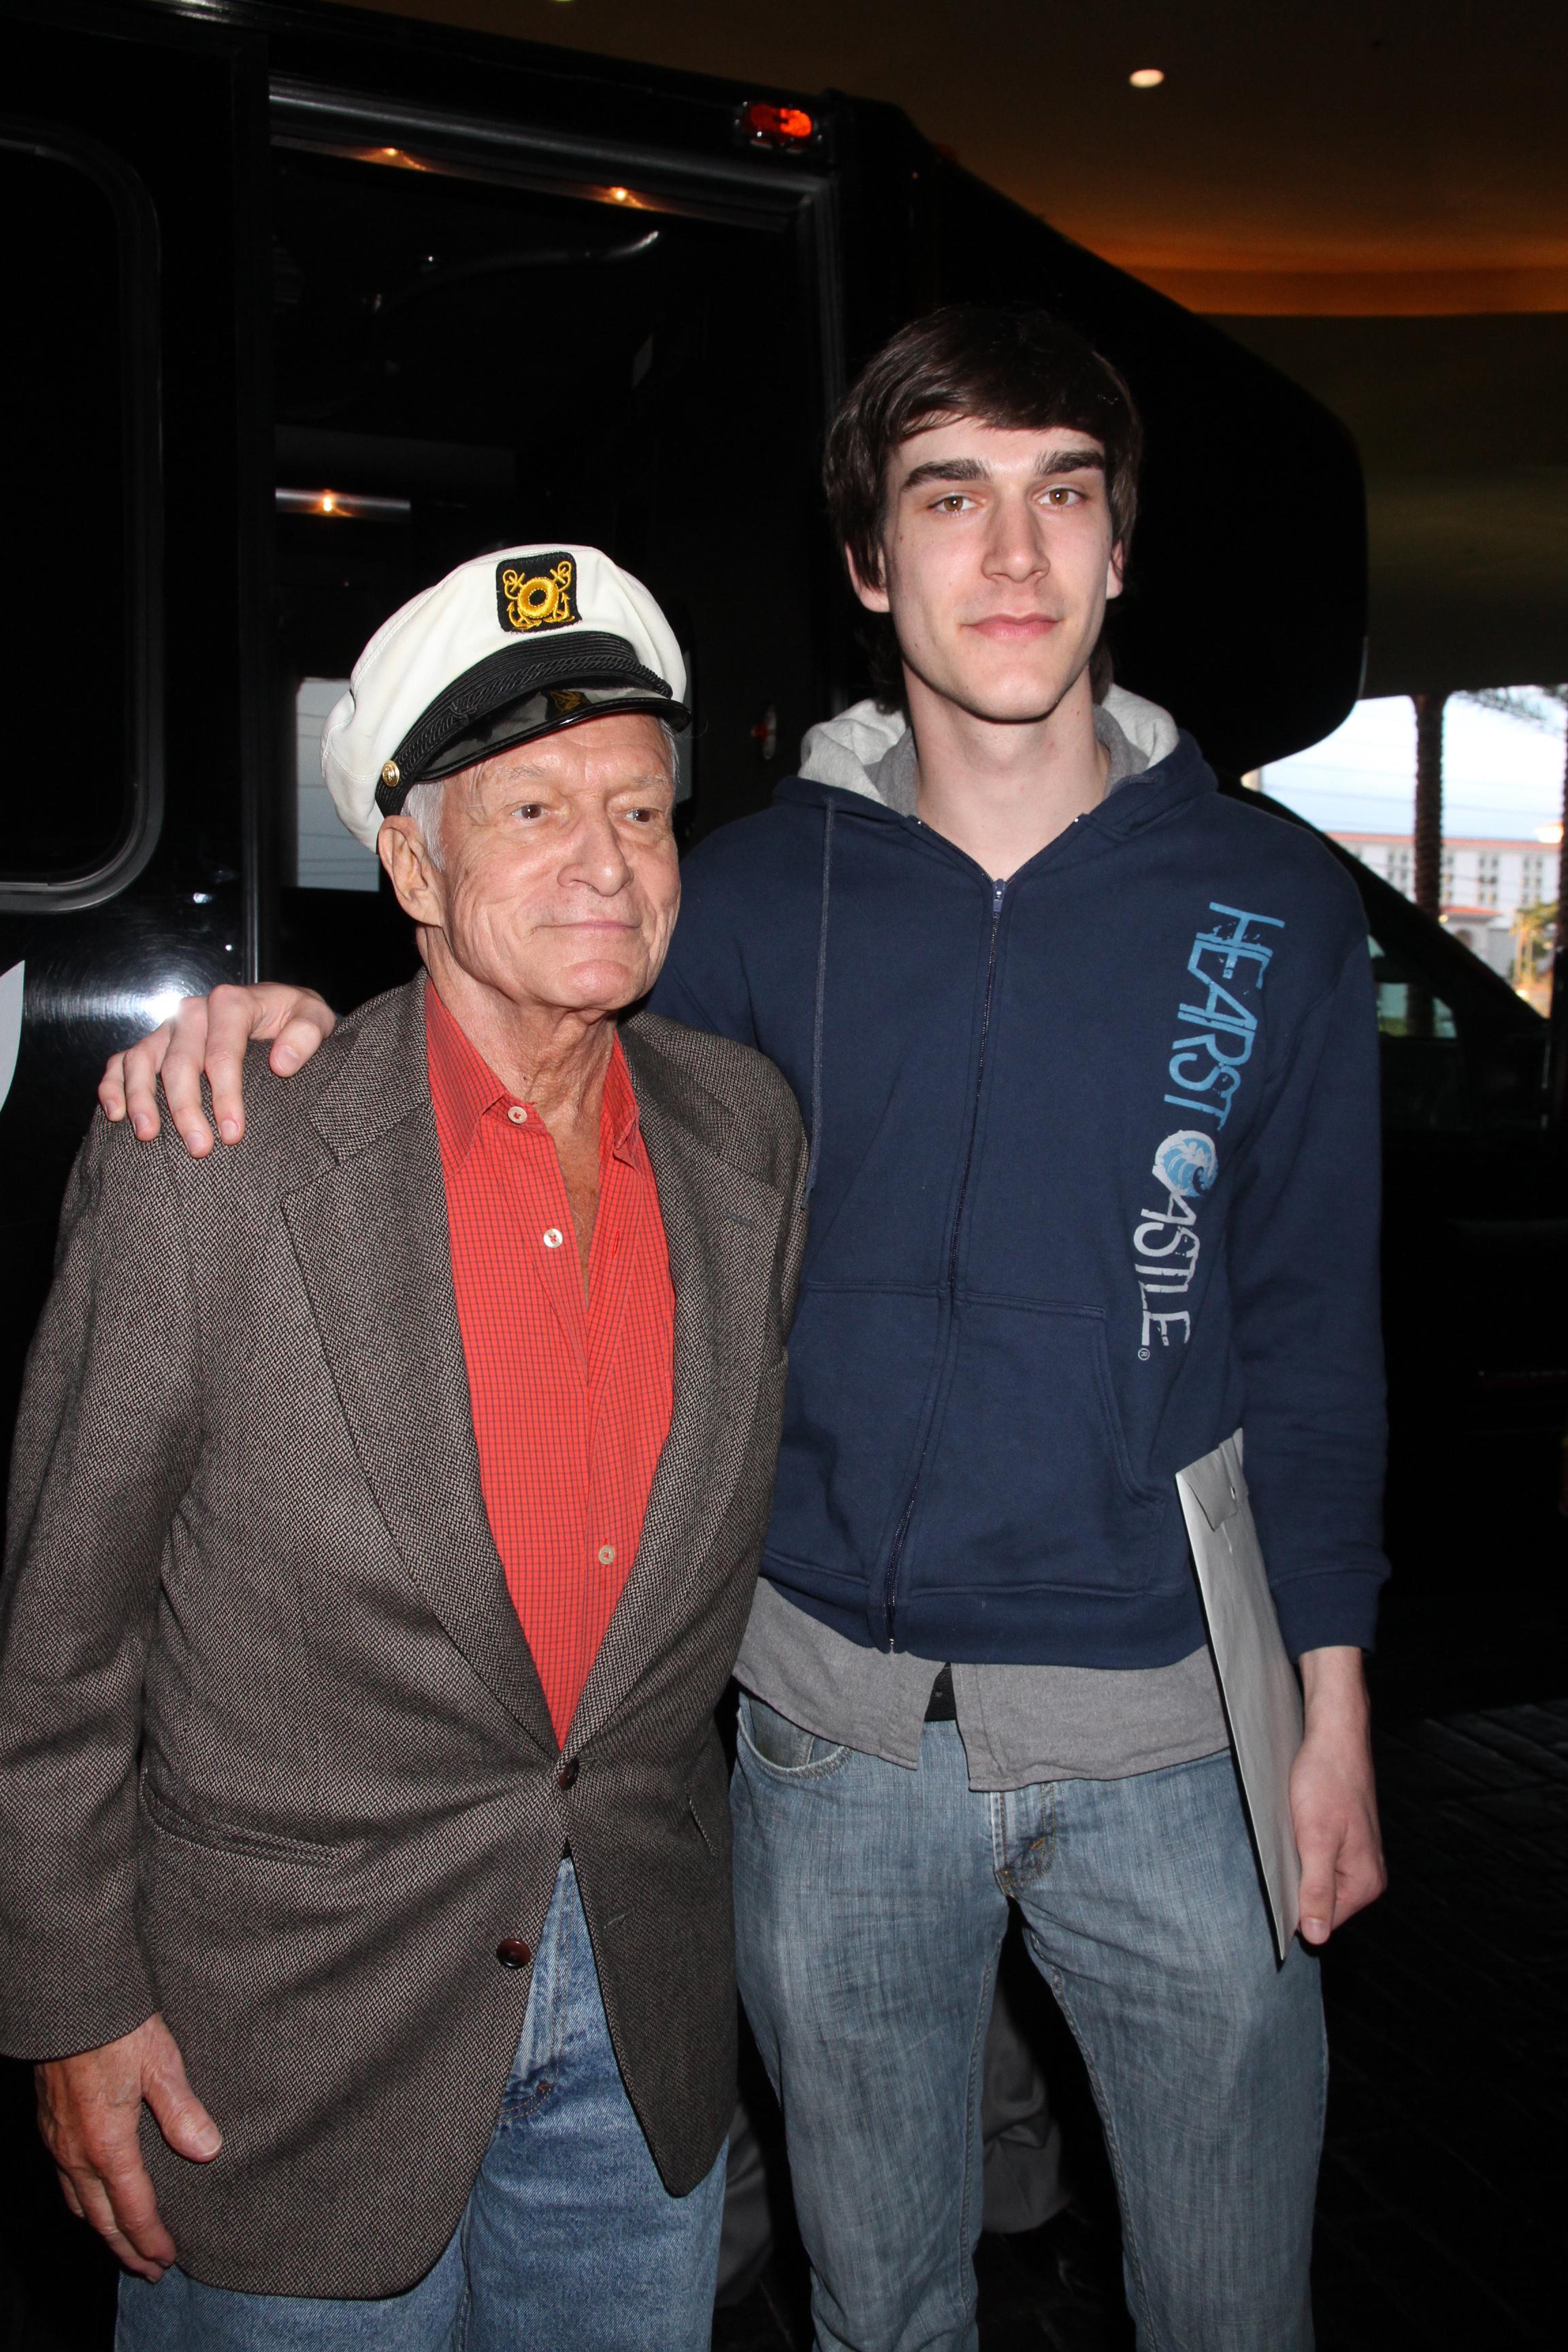 Hugh Hefner and son Marston Hefner celebrate their birthdays at The Palms Casino Resort in Las Vegas on April 9, 2011.